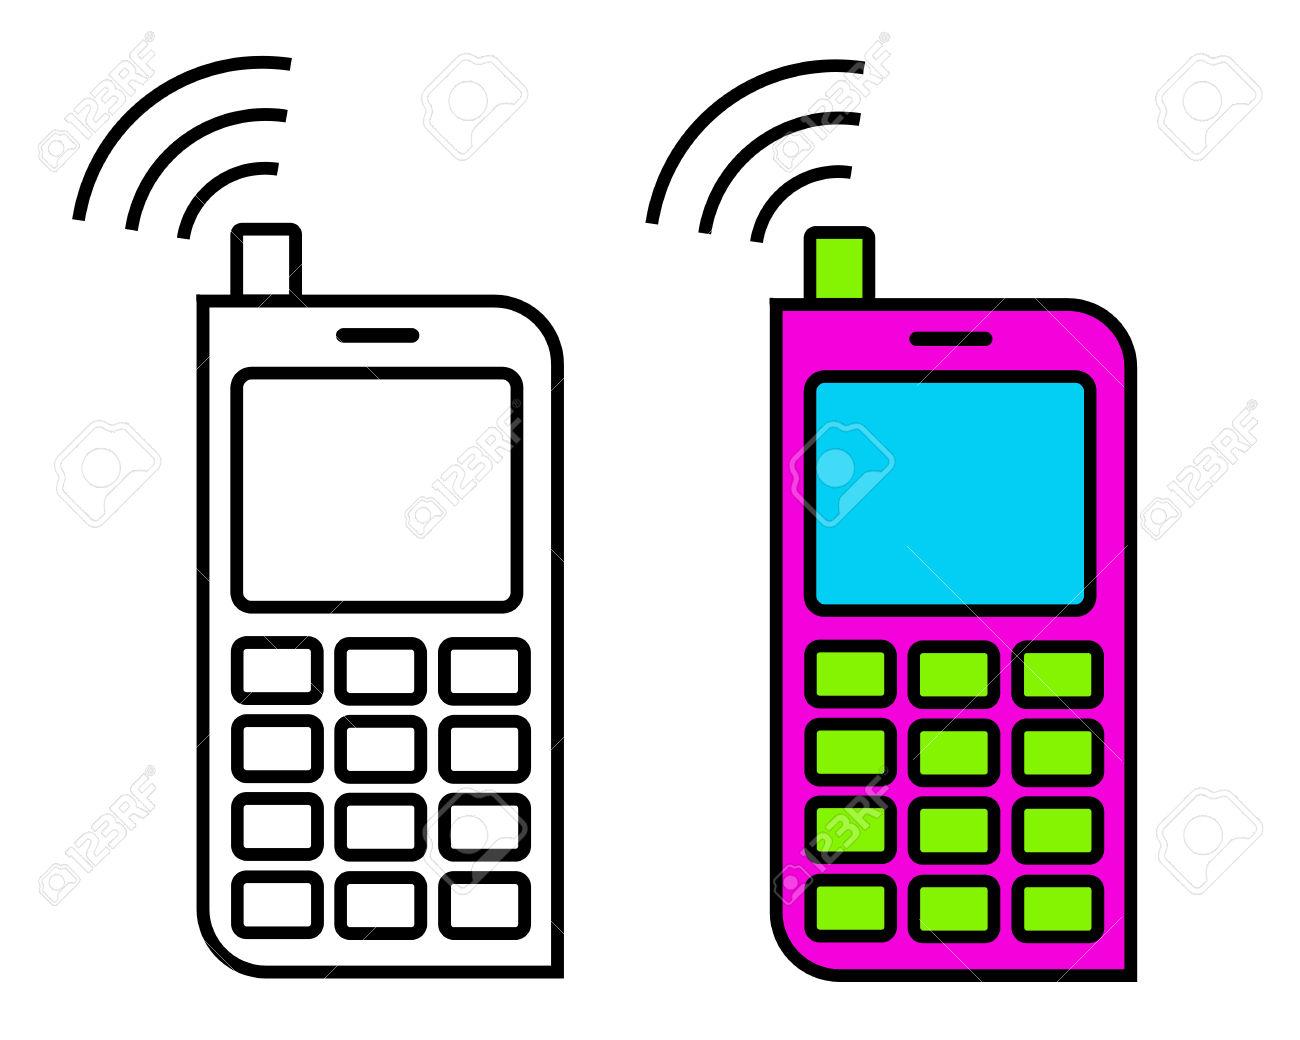 1300x1040 Phone Clipart Simple